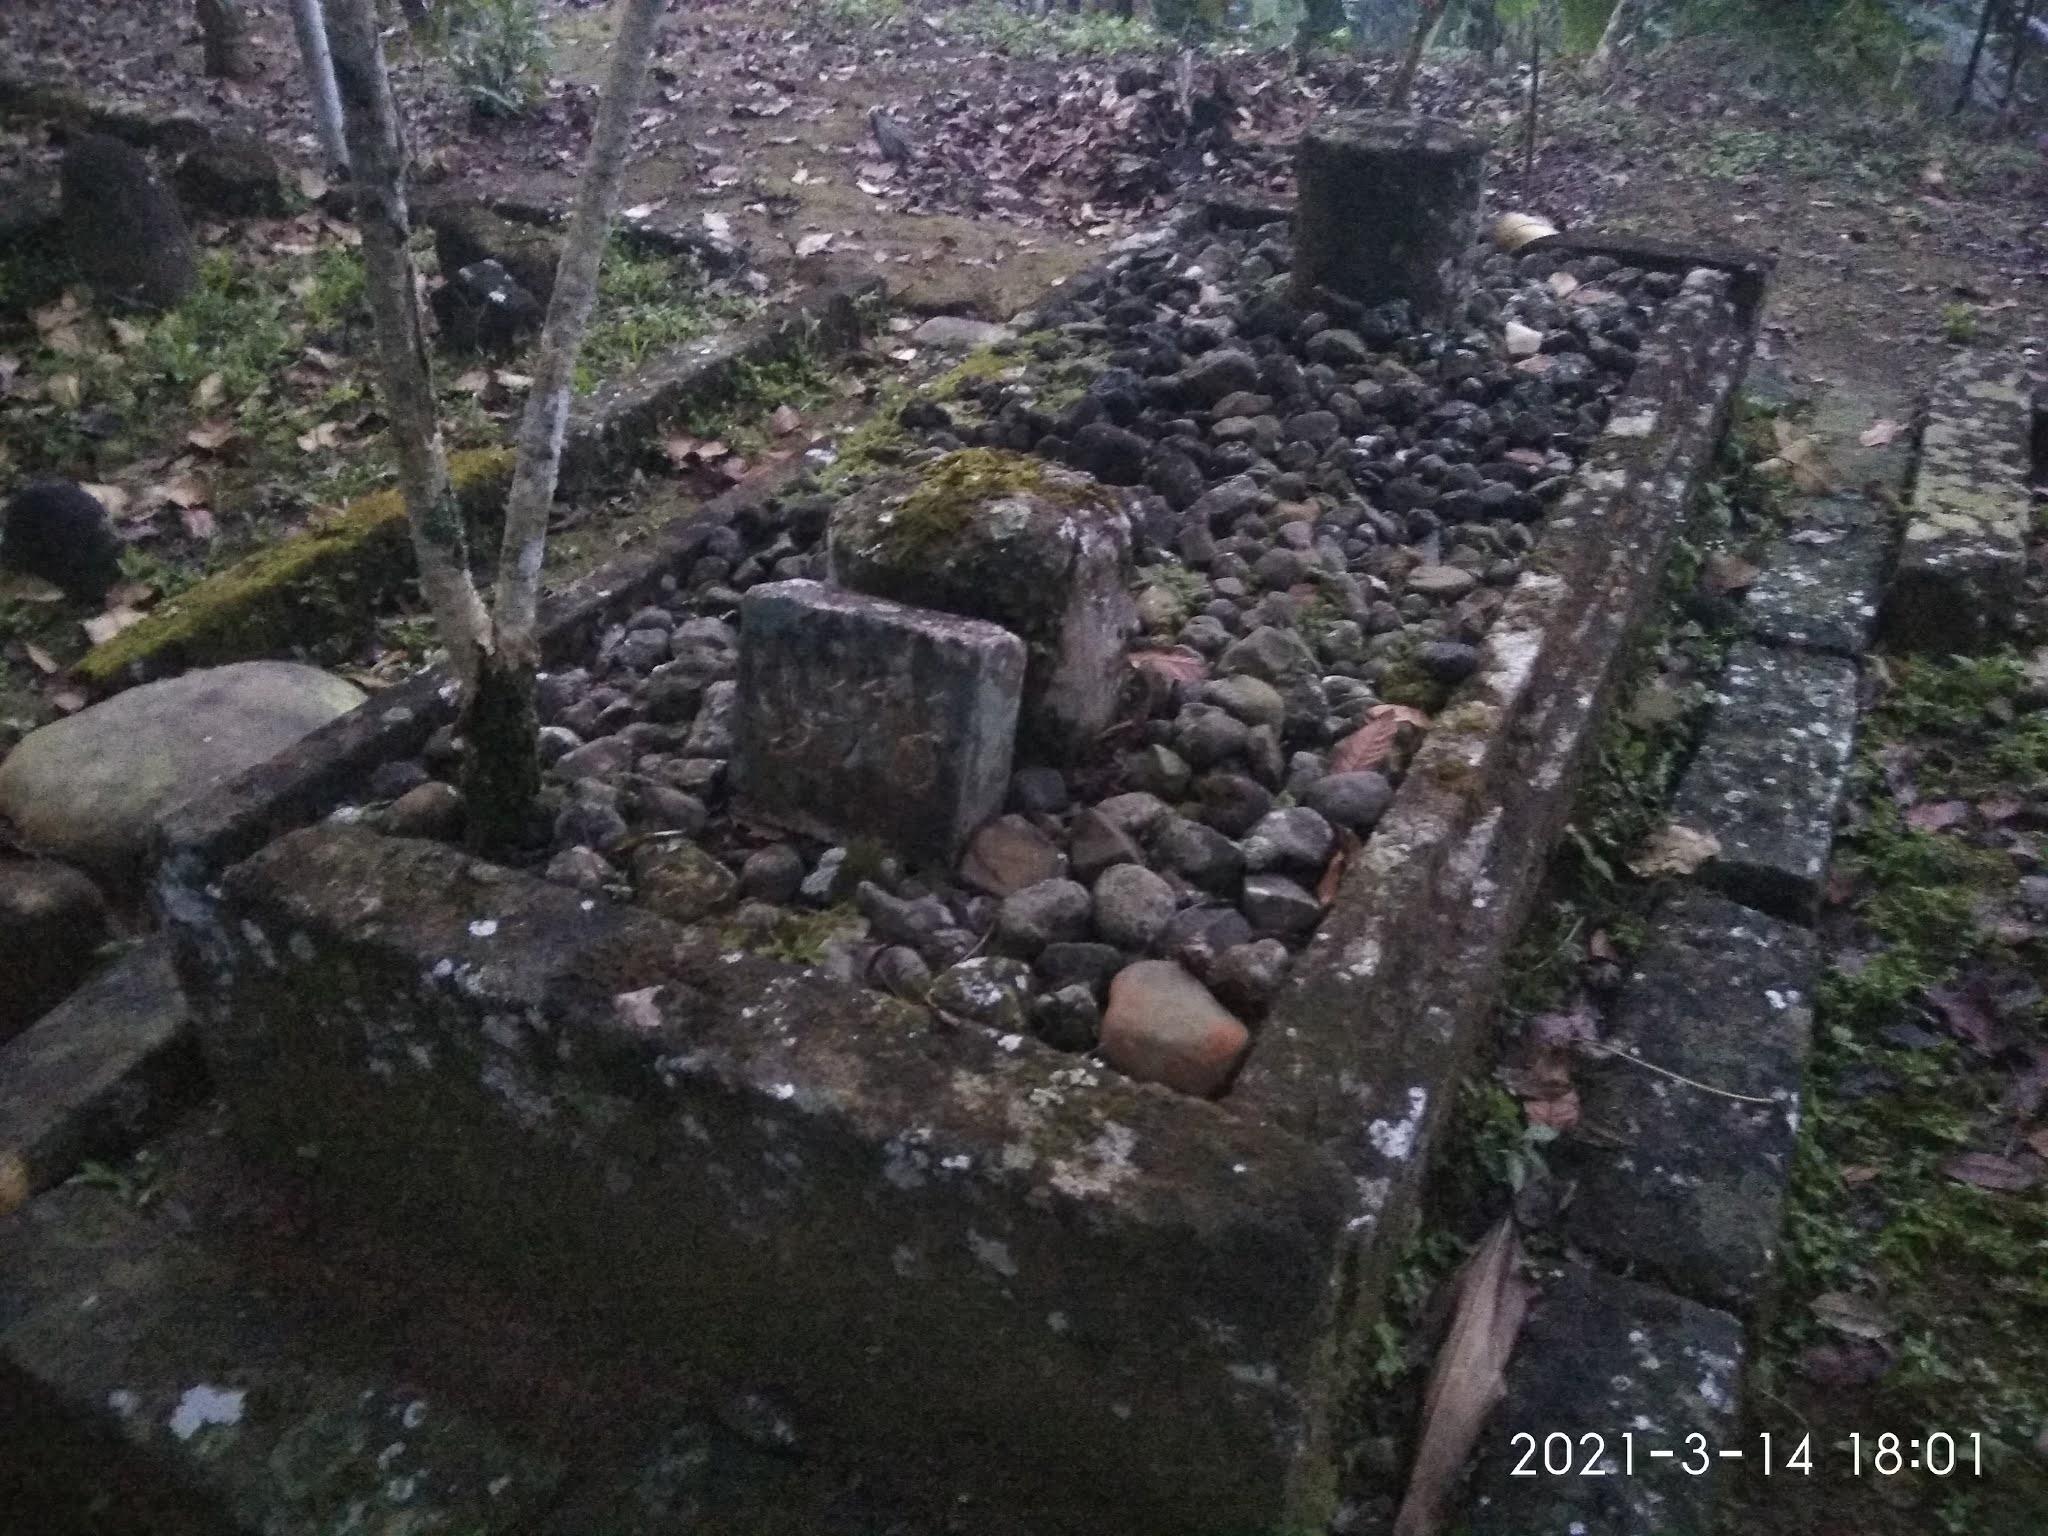 Silsilah Makam Keluarga Raden Singo Suto / Singa Taruna (Mojotengah Wonosobo)